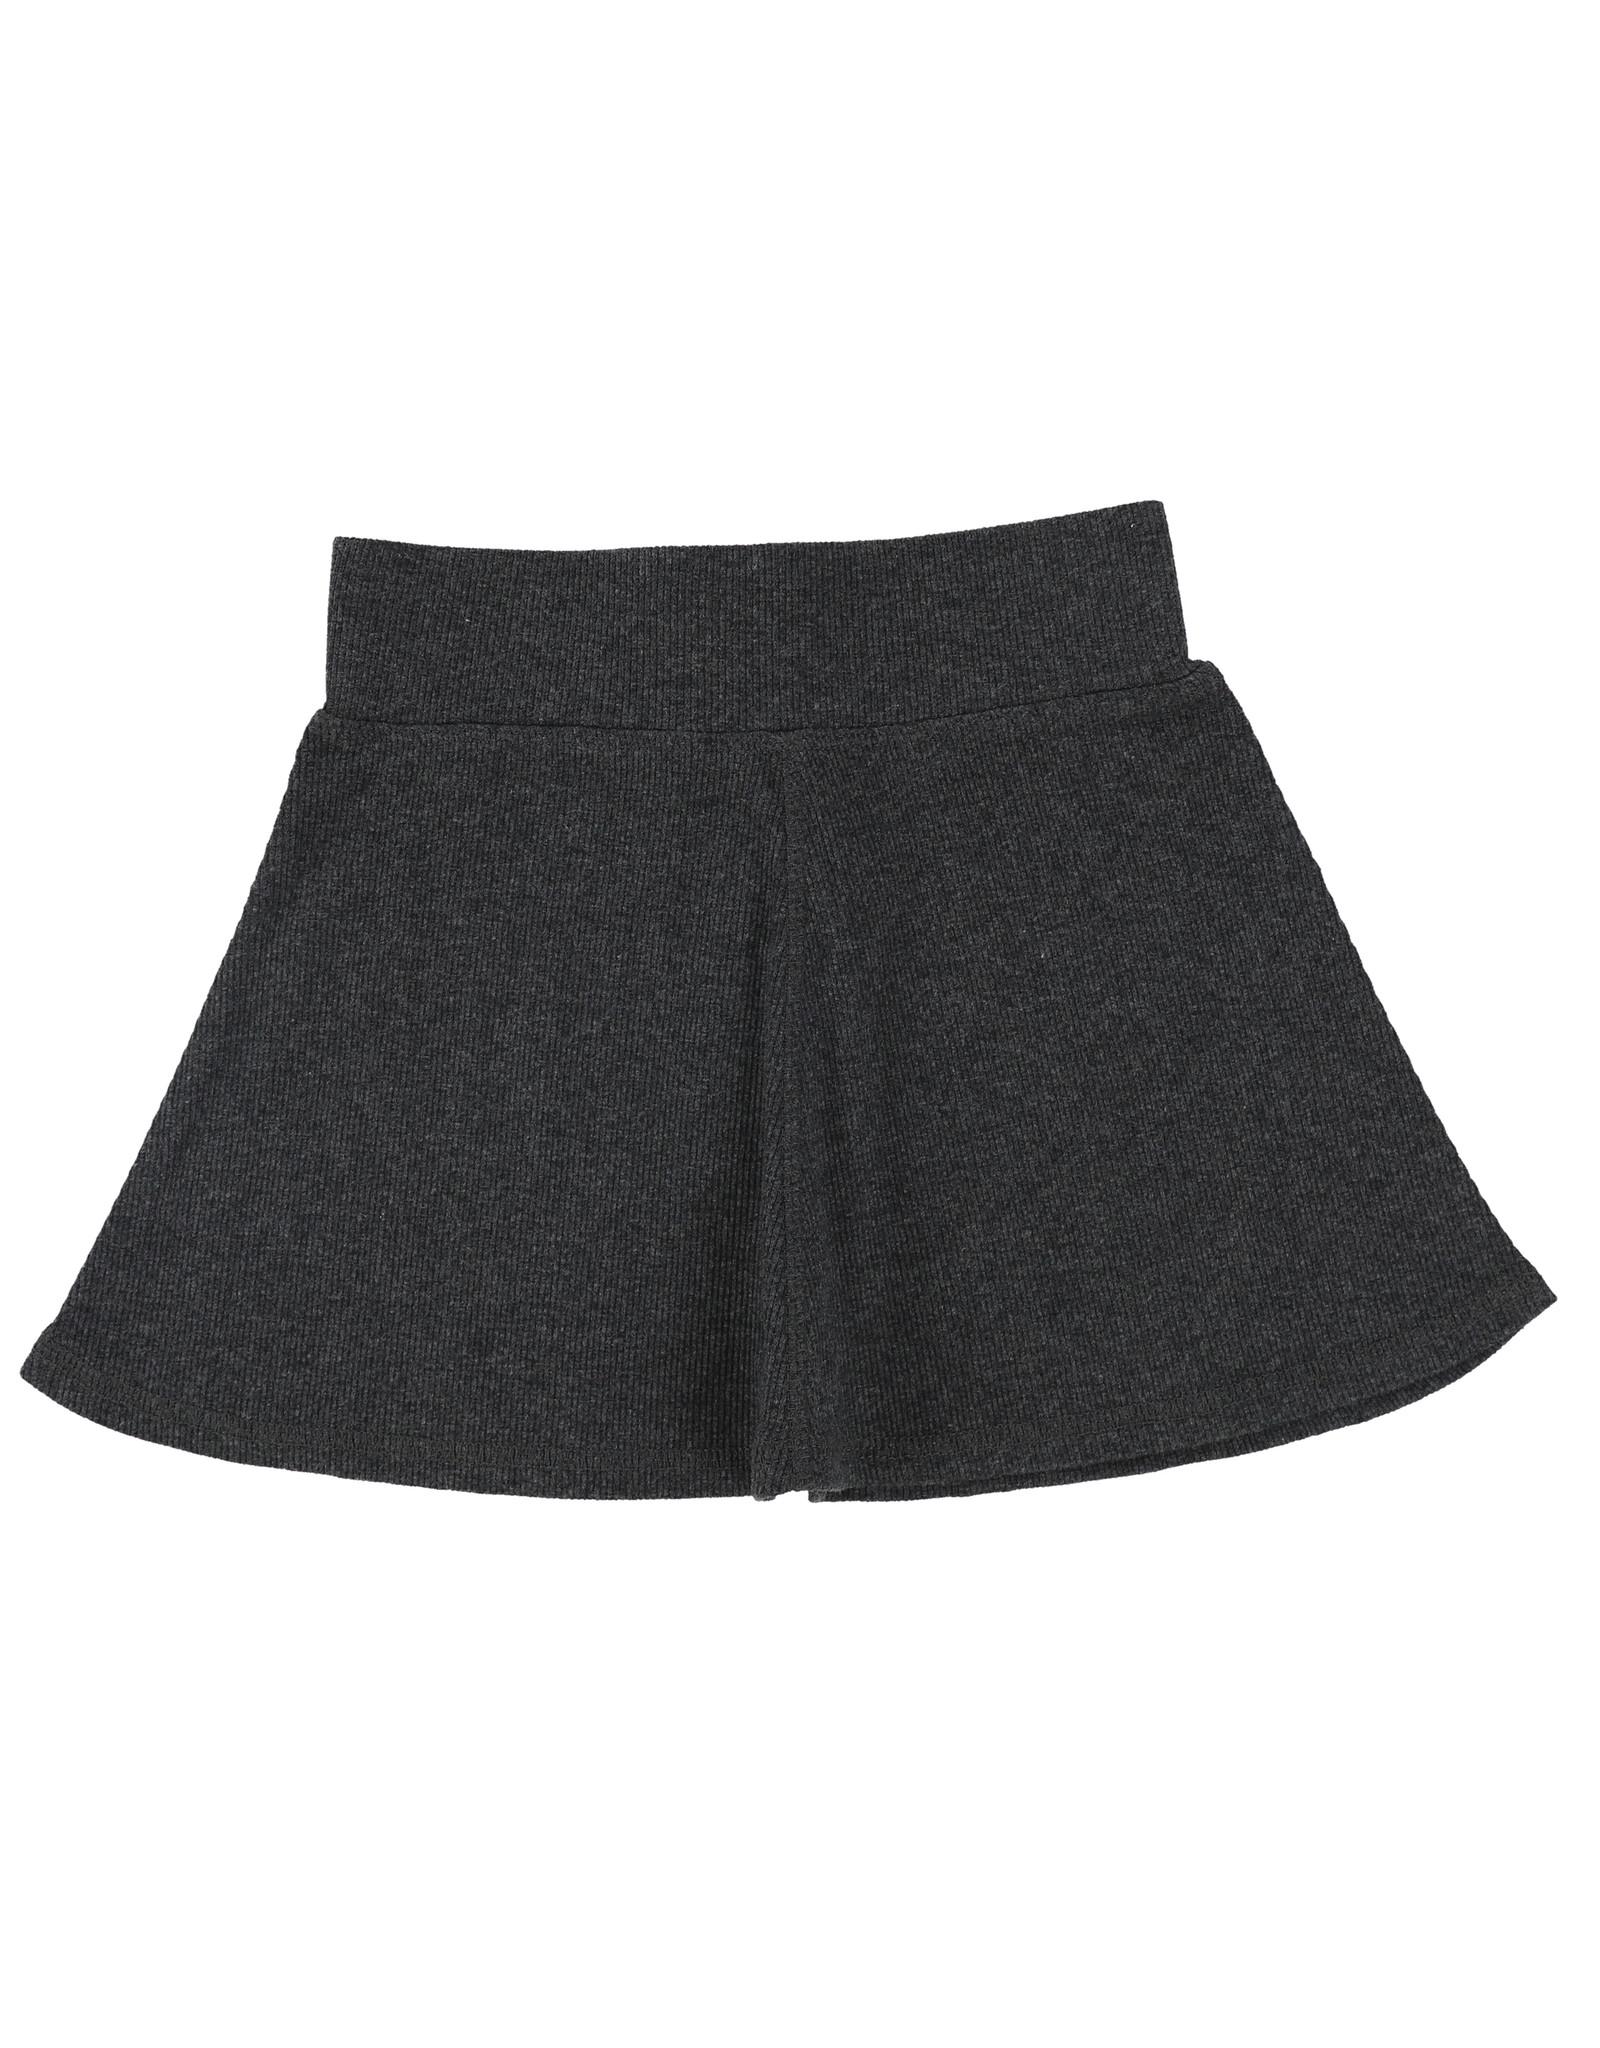 LIL LEGS FW20 Rib Skirt